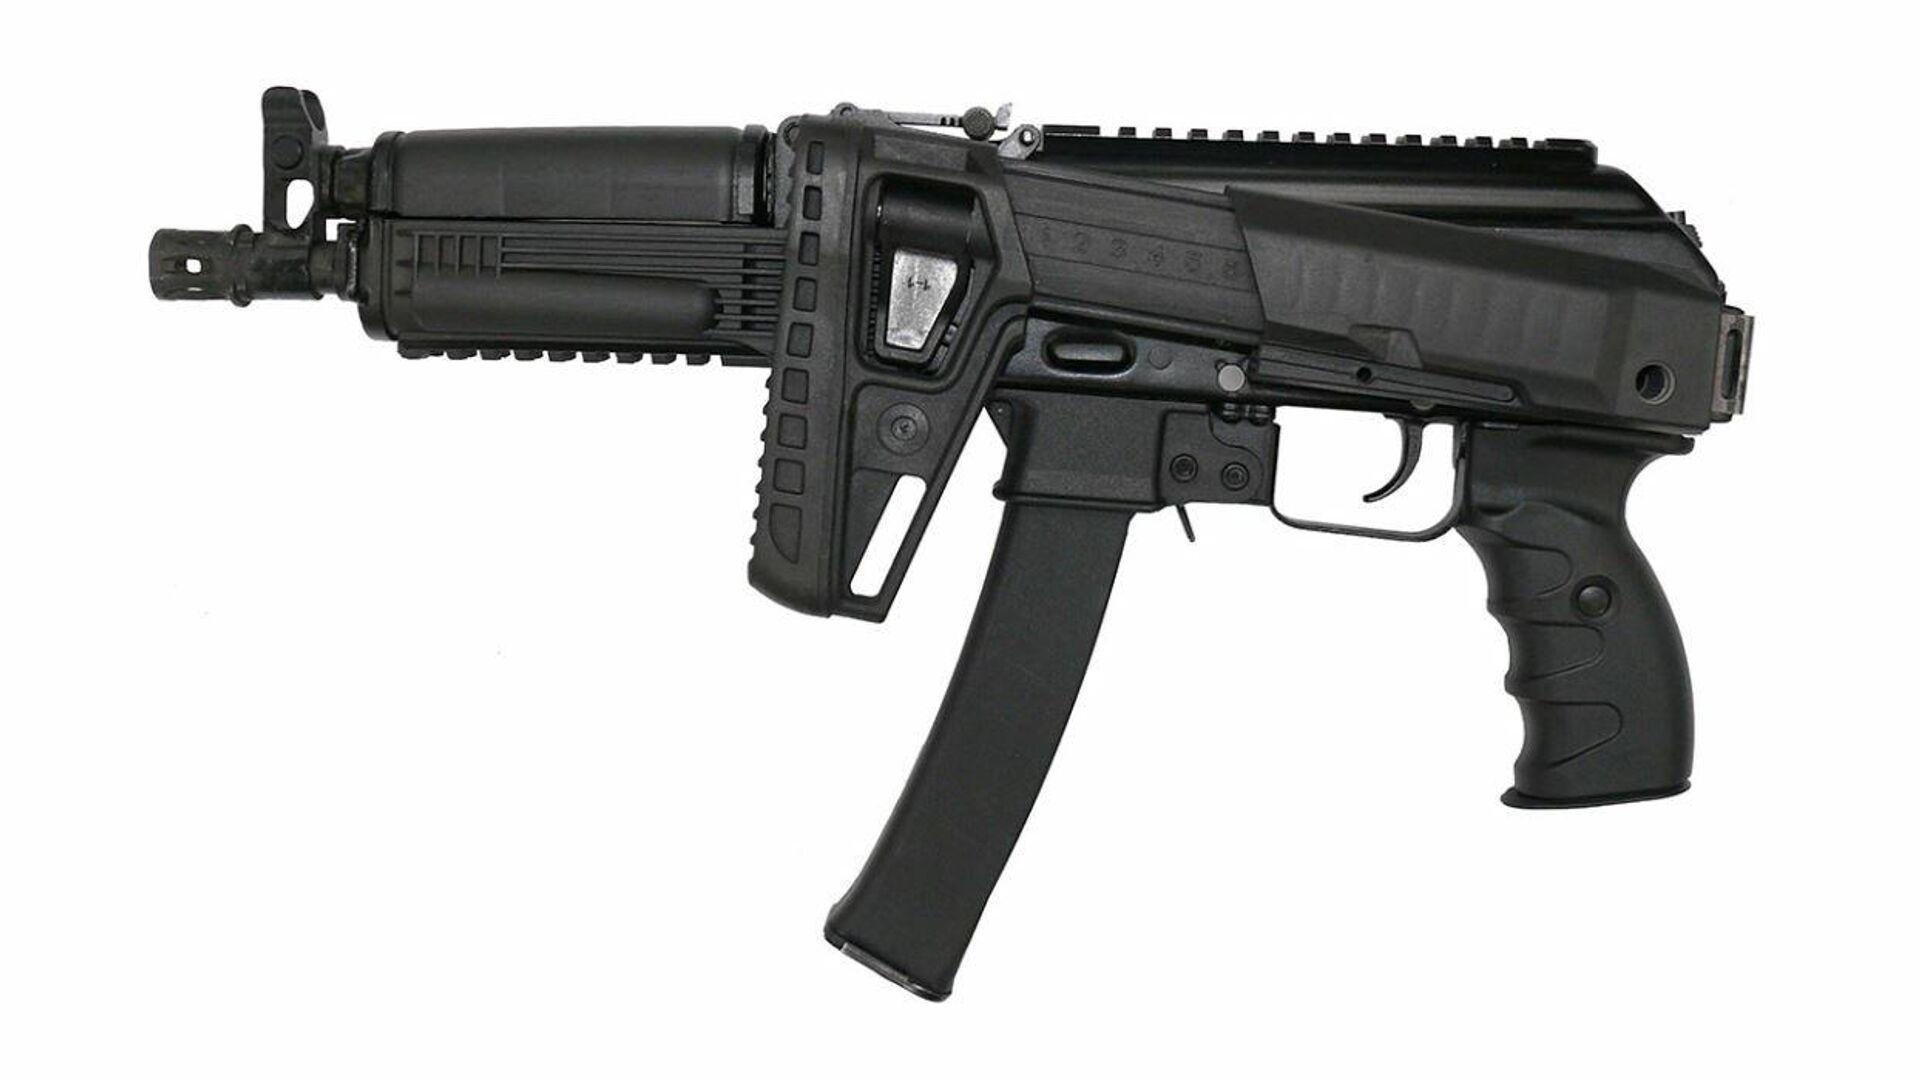 Пистолет-пулемет Калашникова ППК-20 - РИА Новости, 1920, 22.08.2021